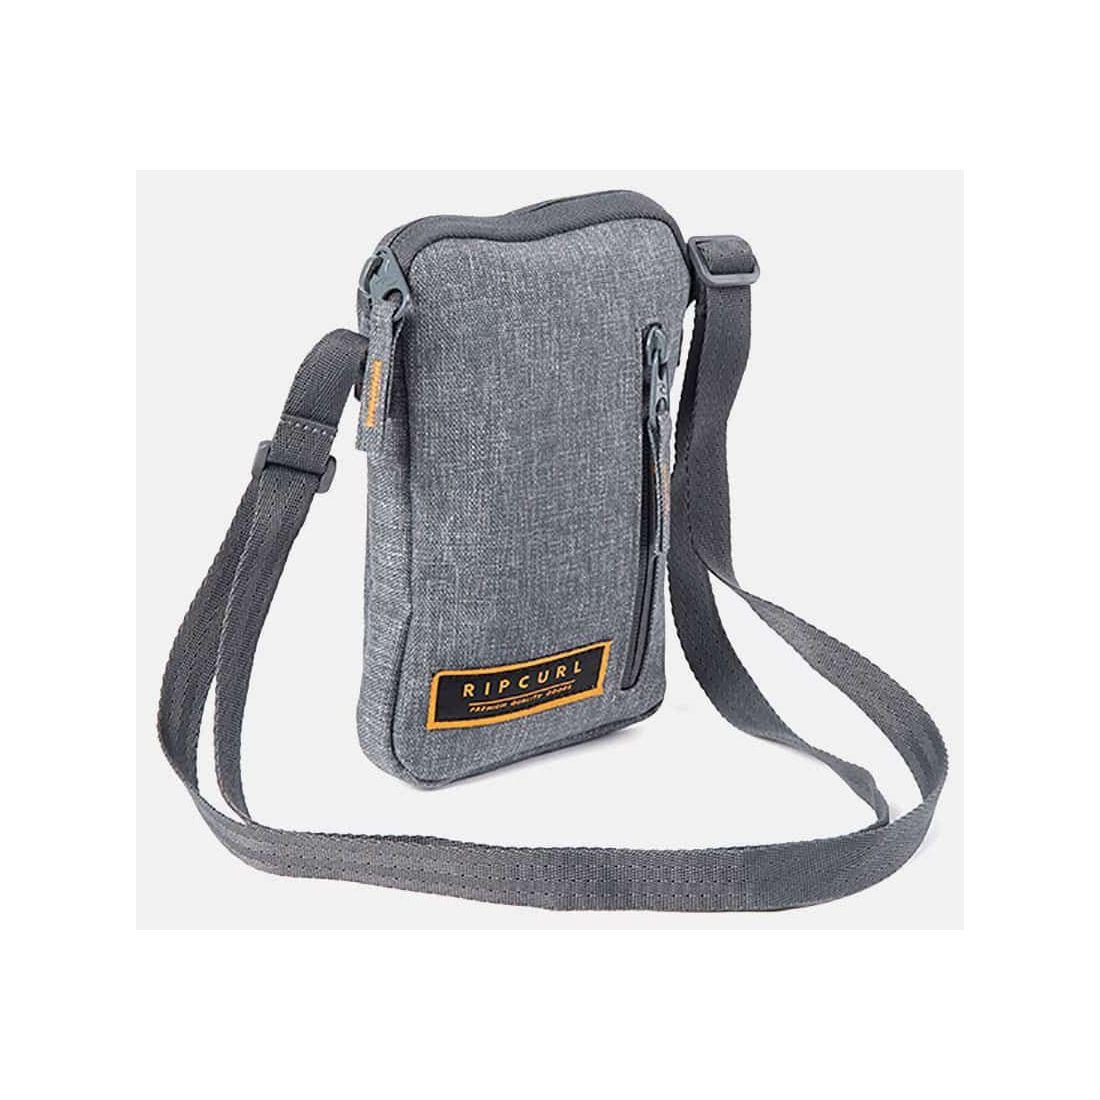 Rip Curl Bag Slim Pouch Cordura Grey - Backpacks - Bags